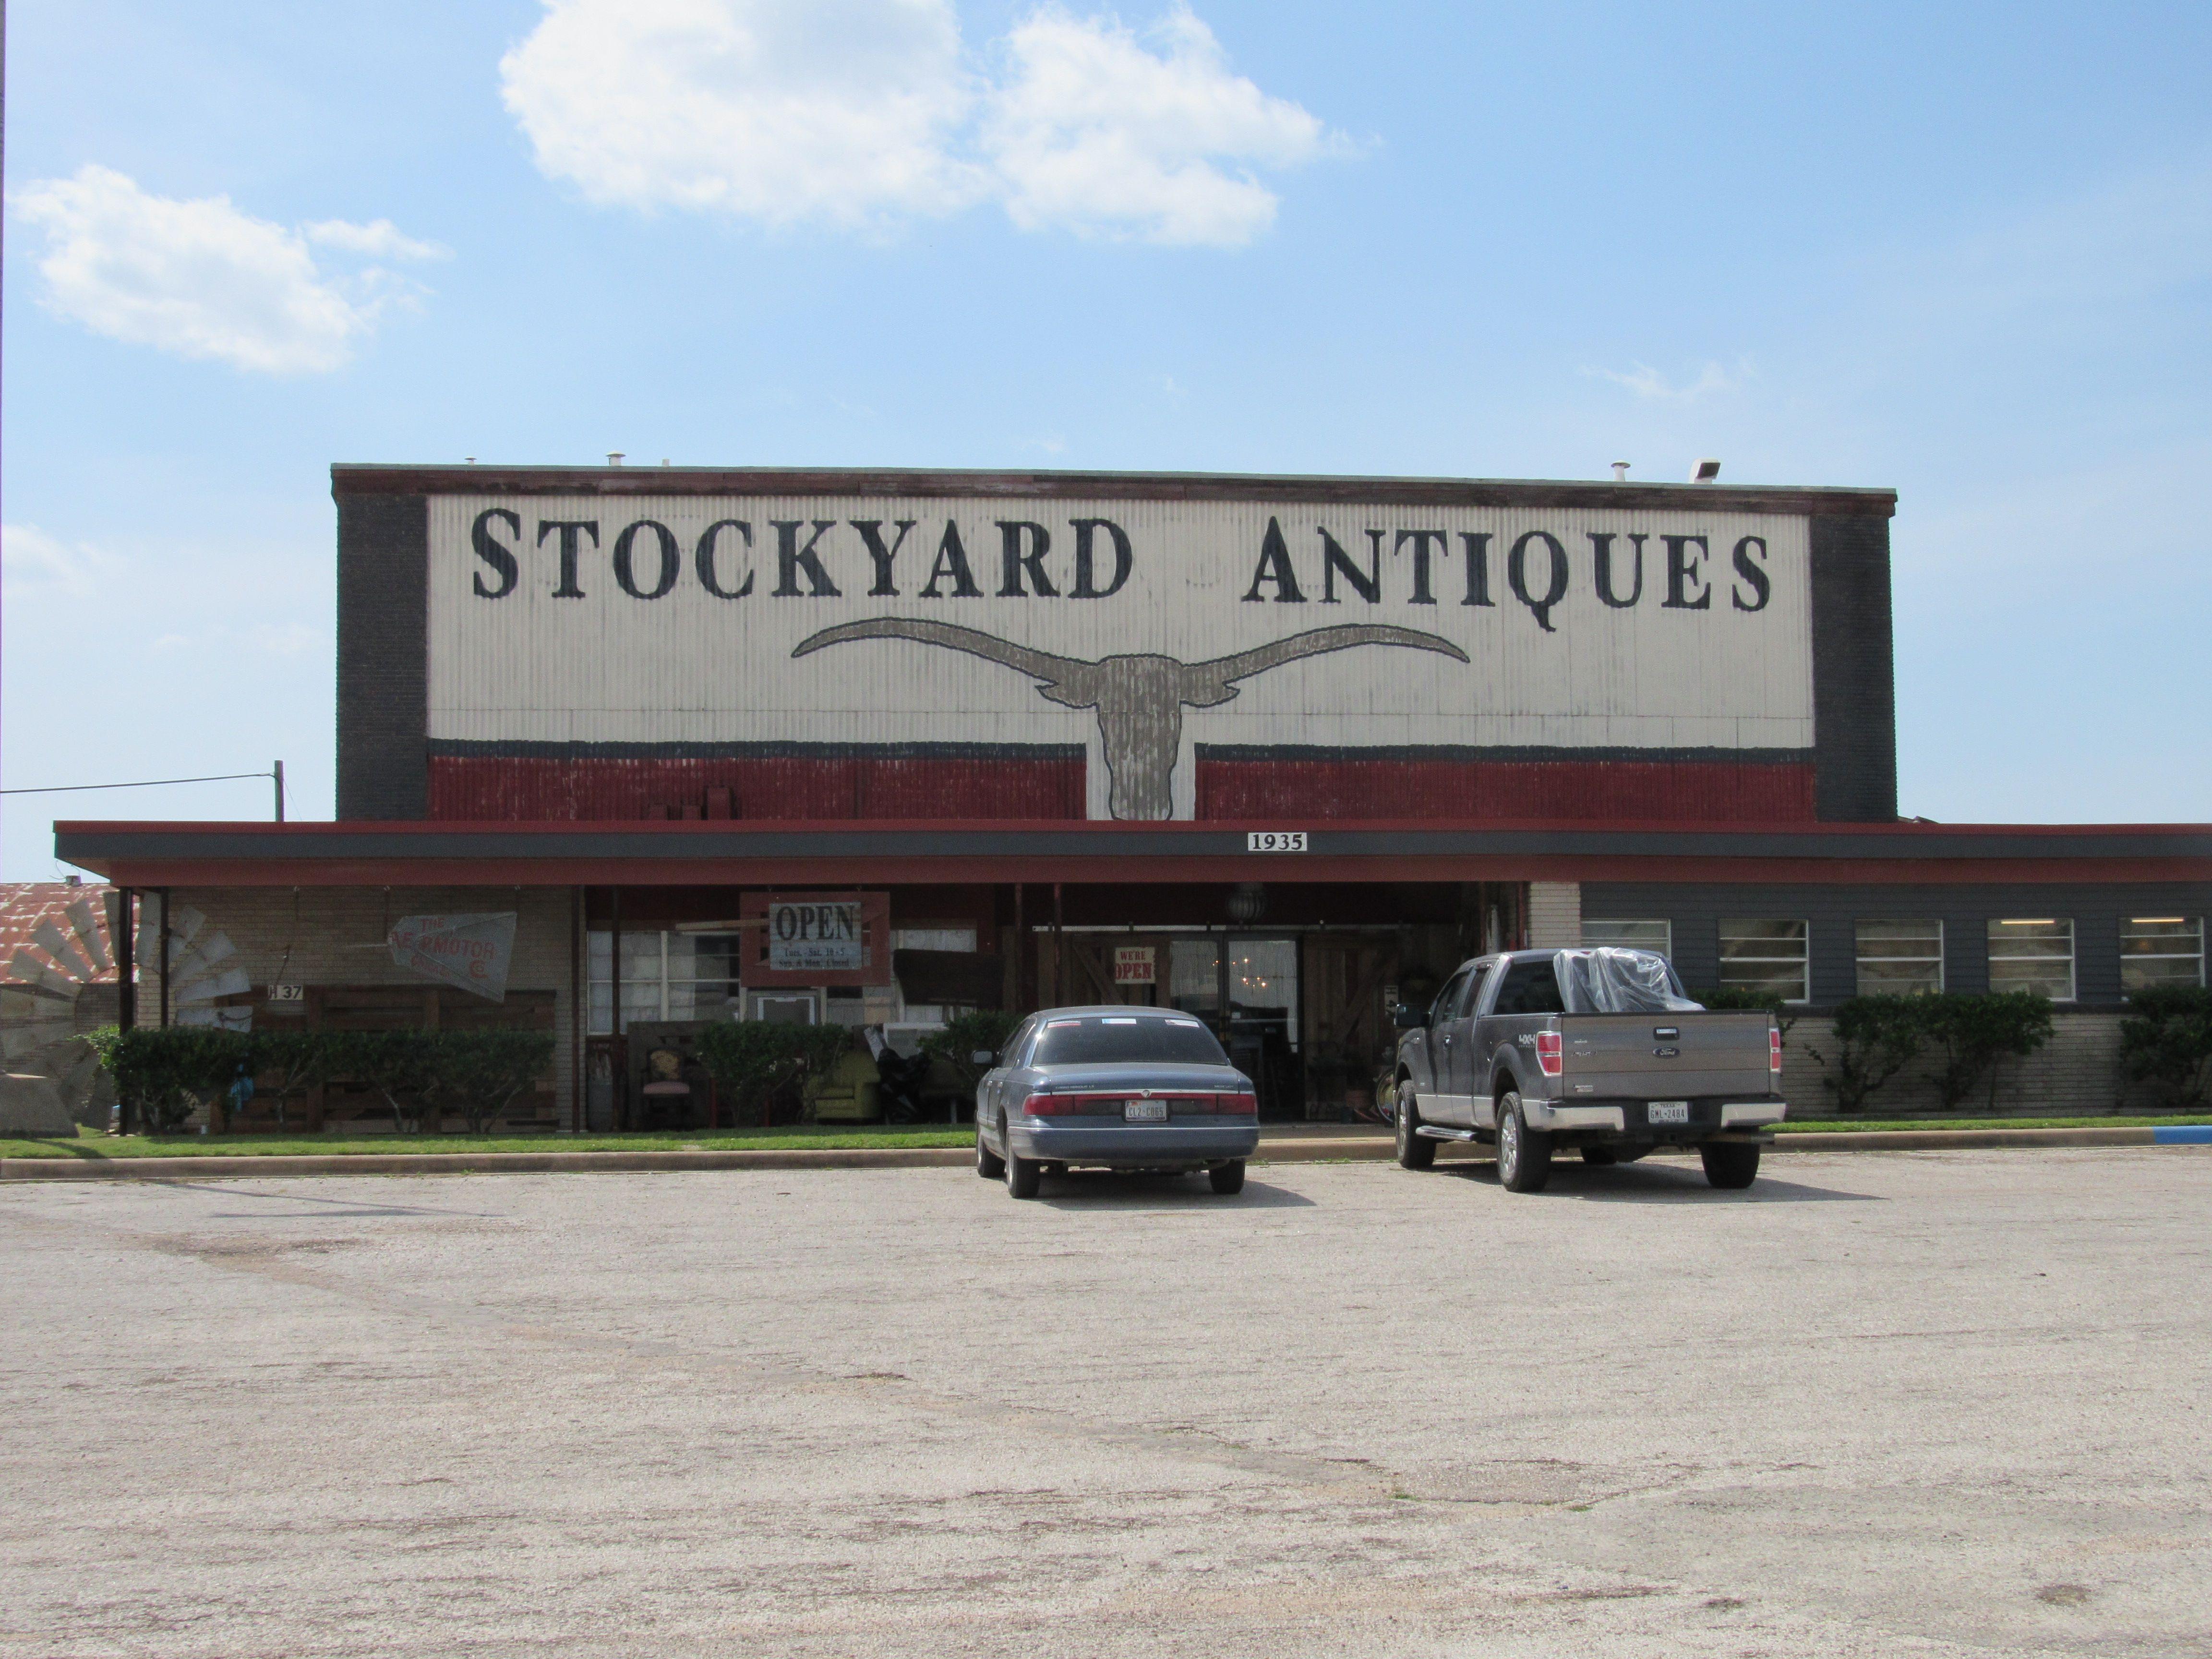 Stockyard Antiques 1935 Tx 36 Sealy Tx 77474 770 503 6611